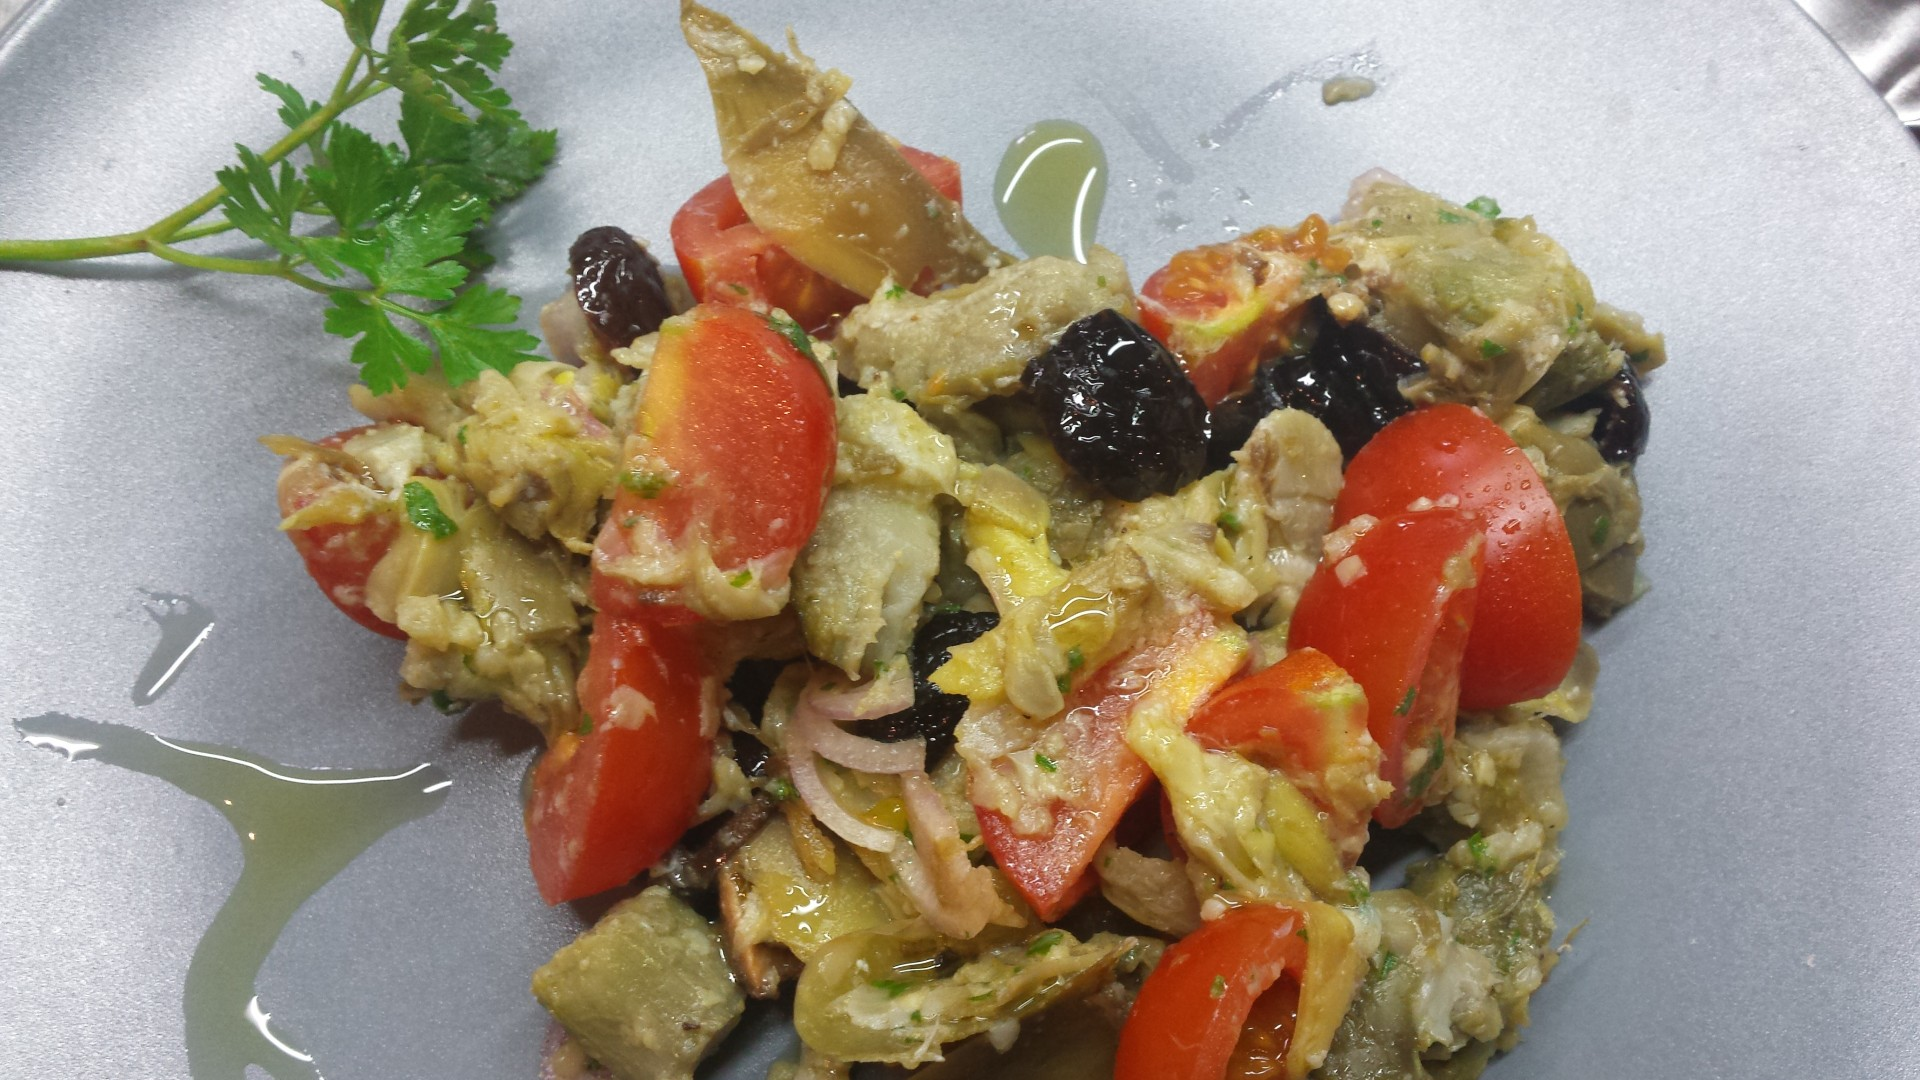 Artichokes salad